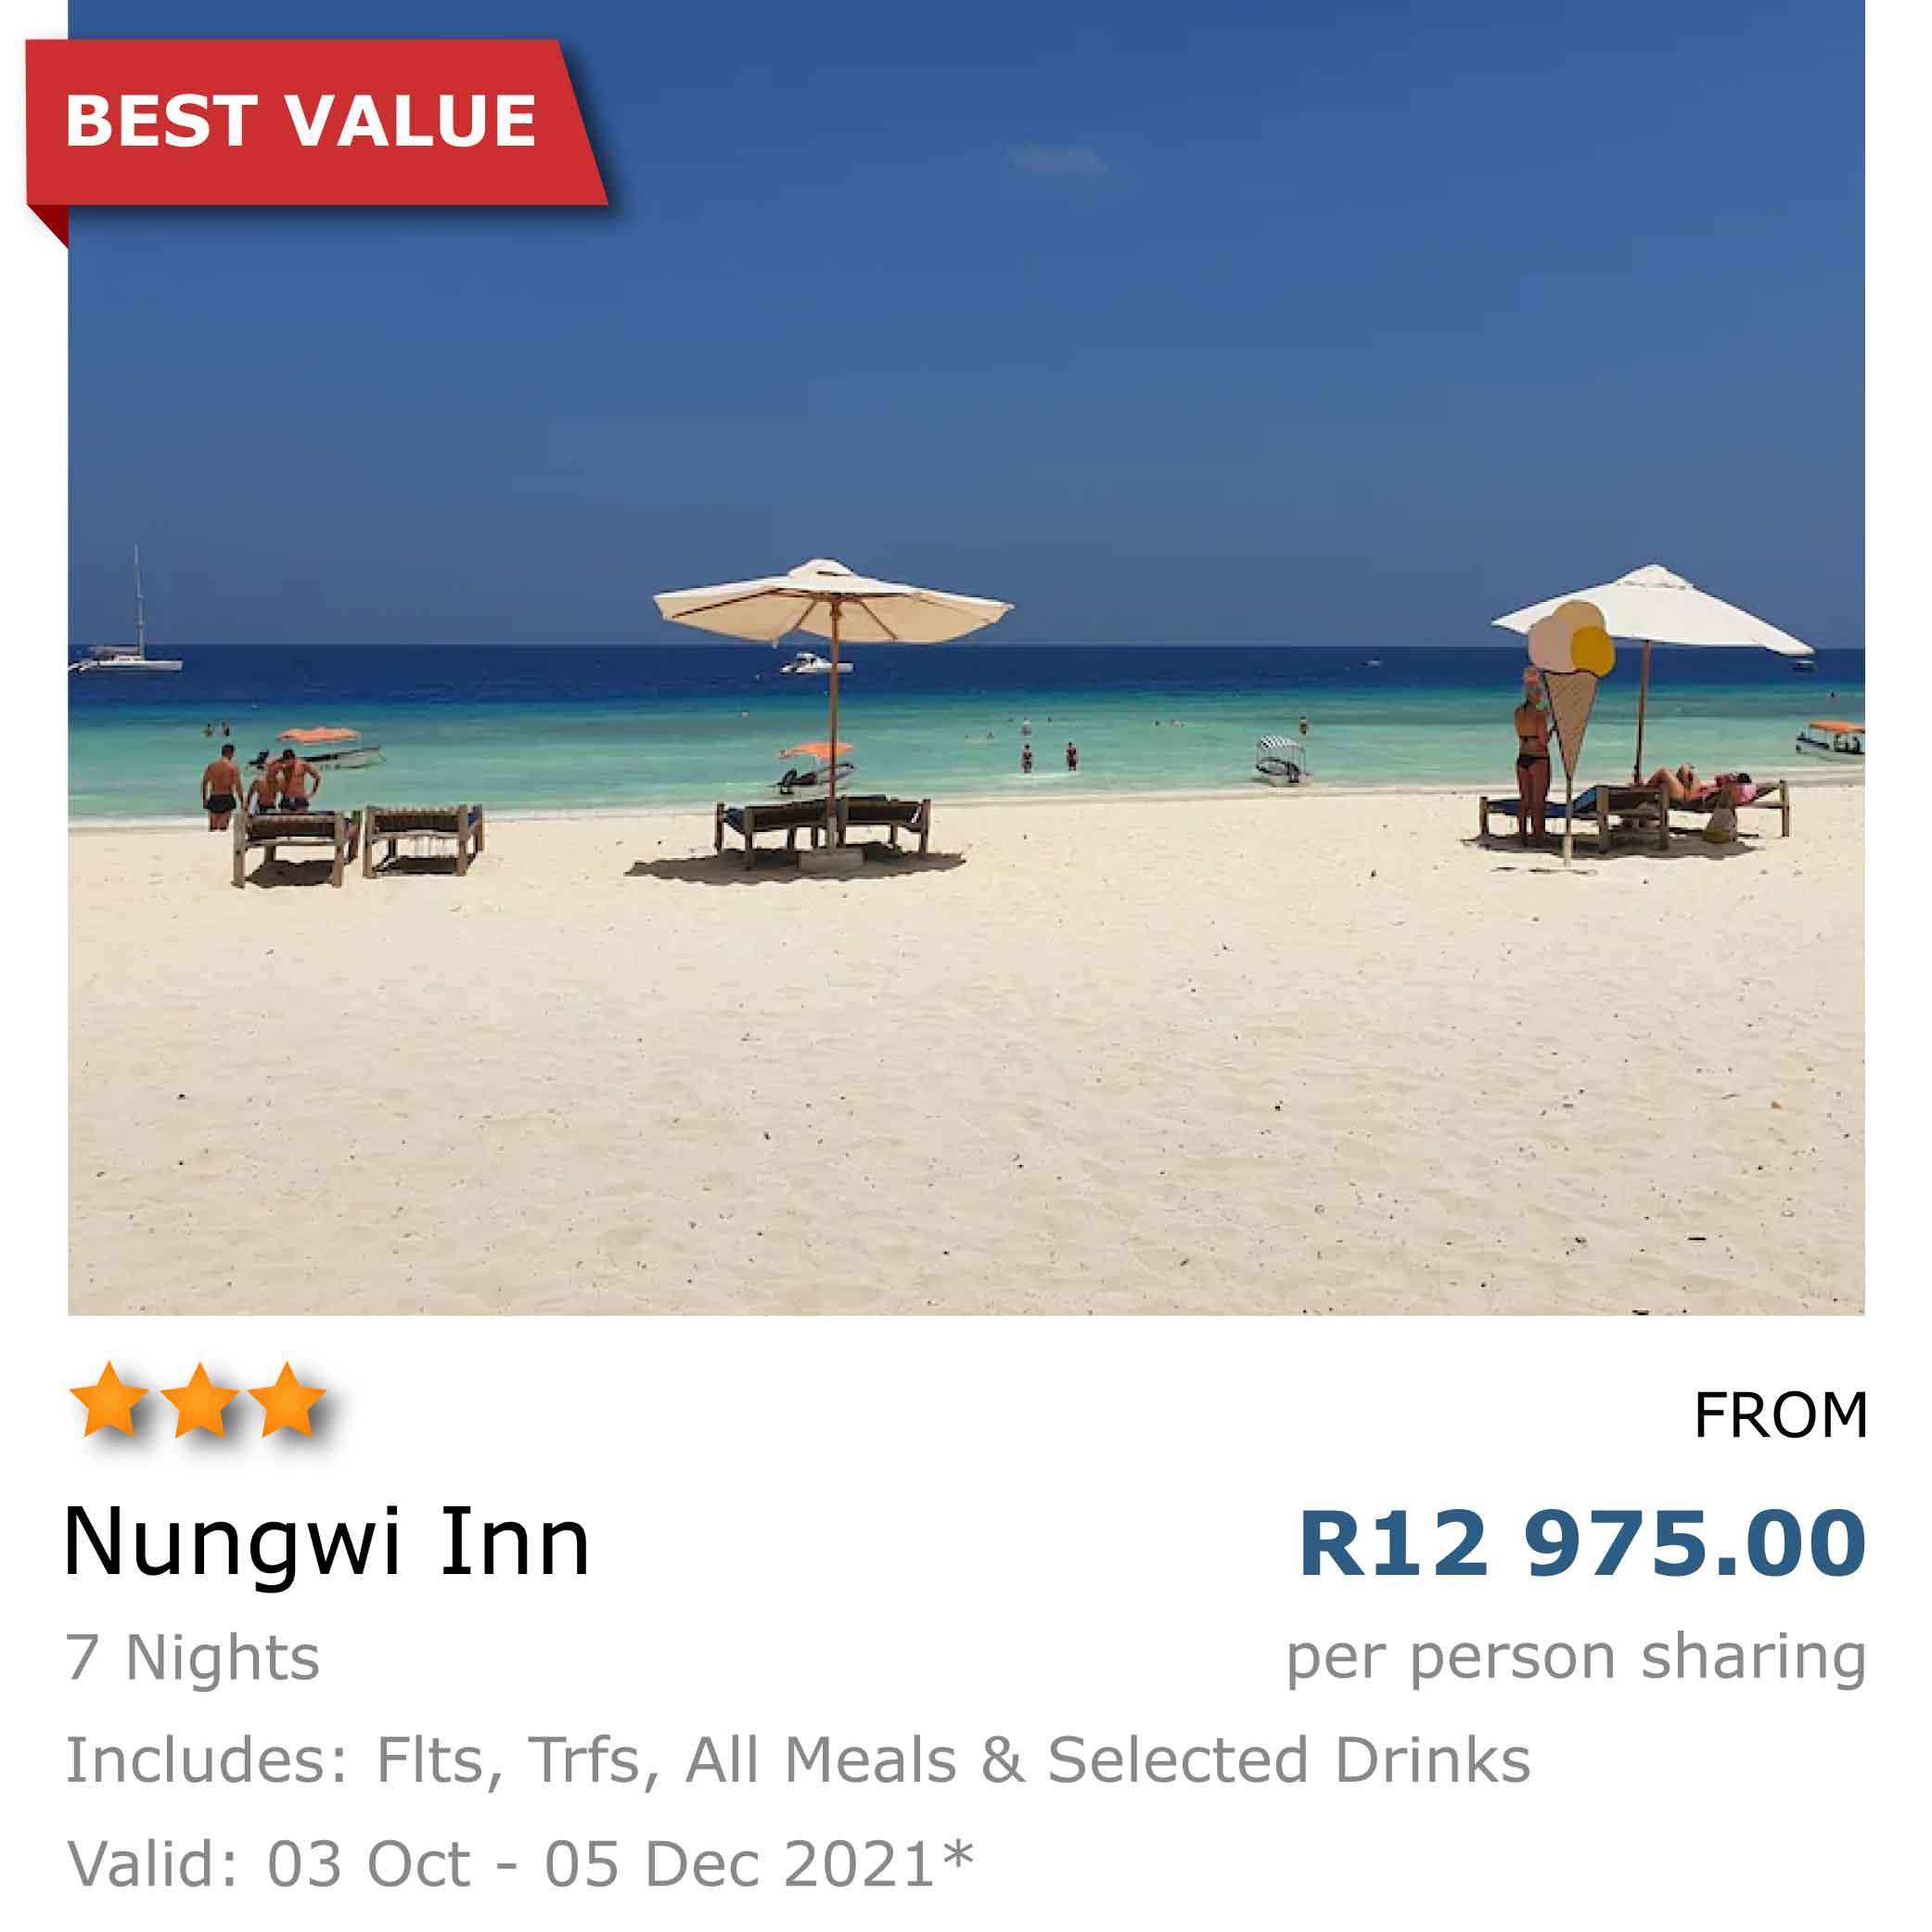 Nungwi Inn